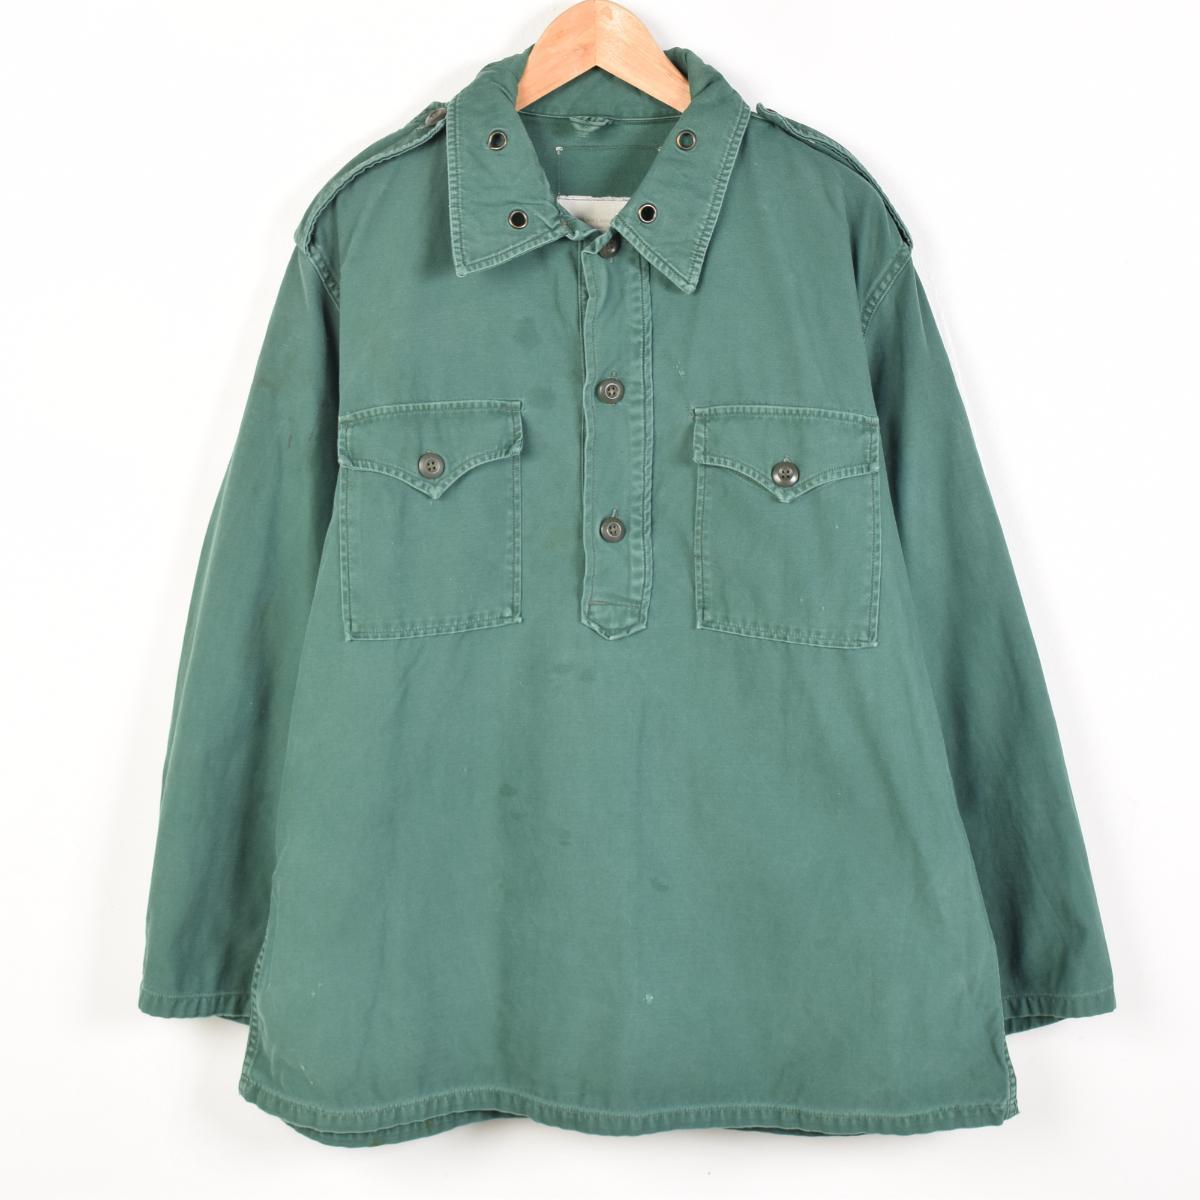 60年代SHIRT,MAN'S,AGGRESSOR,GREEN 255侵略者衬衫军事衬衫人L复古/wez8365